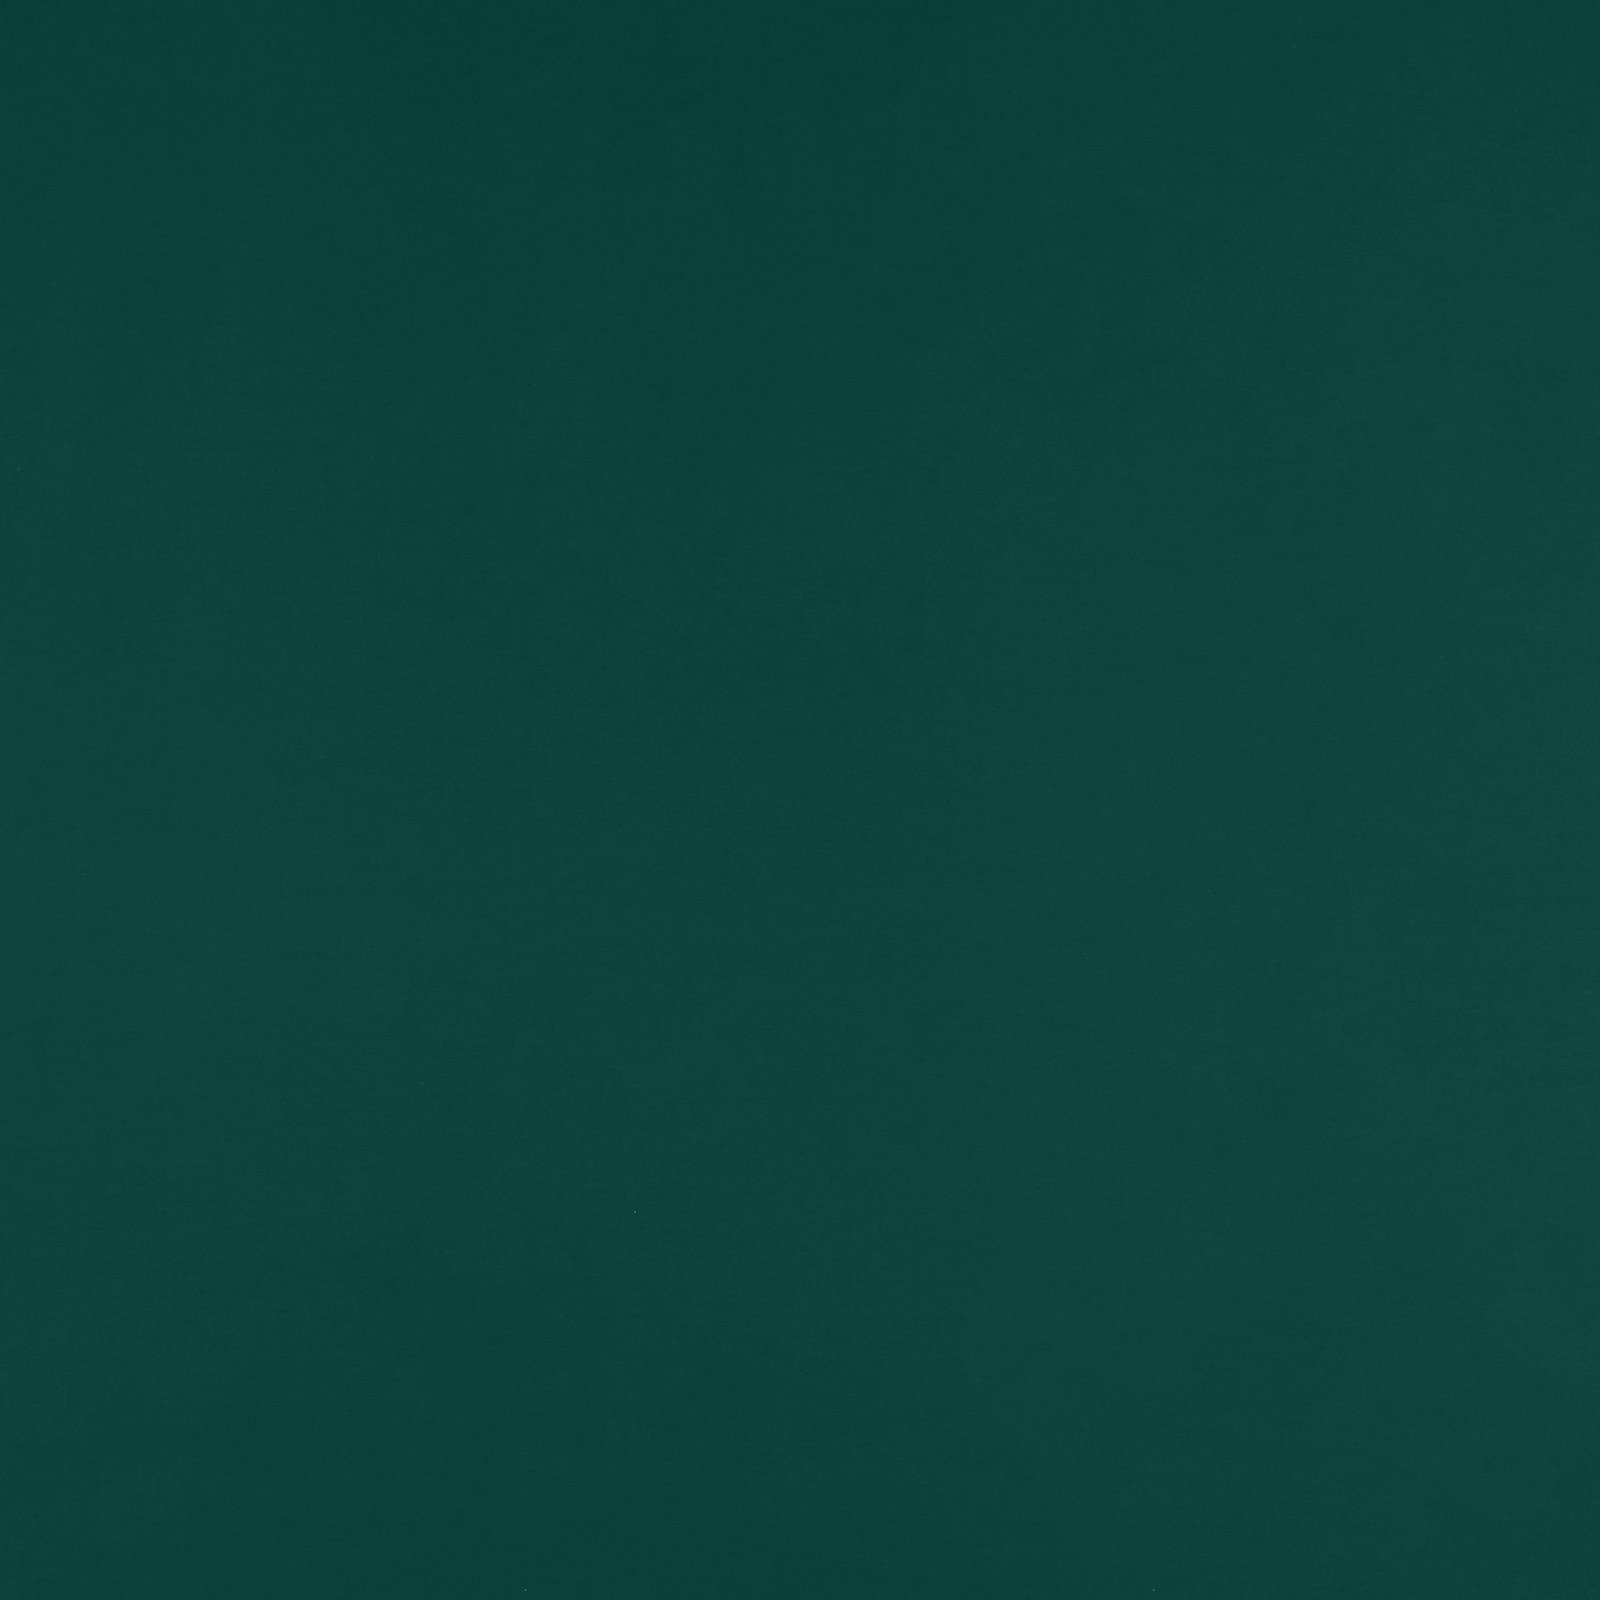 Viscose jersey bottle green 270812_pack_solid